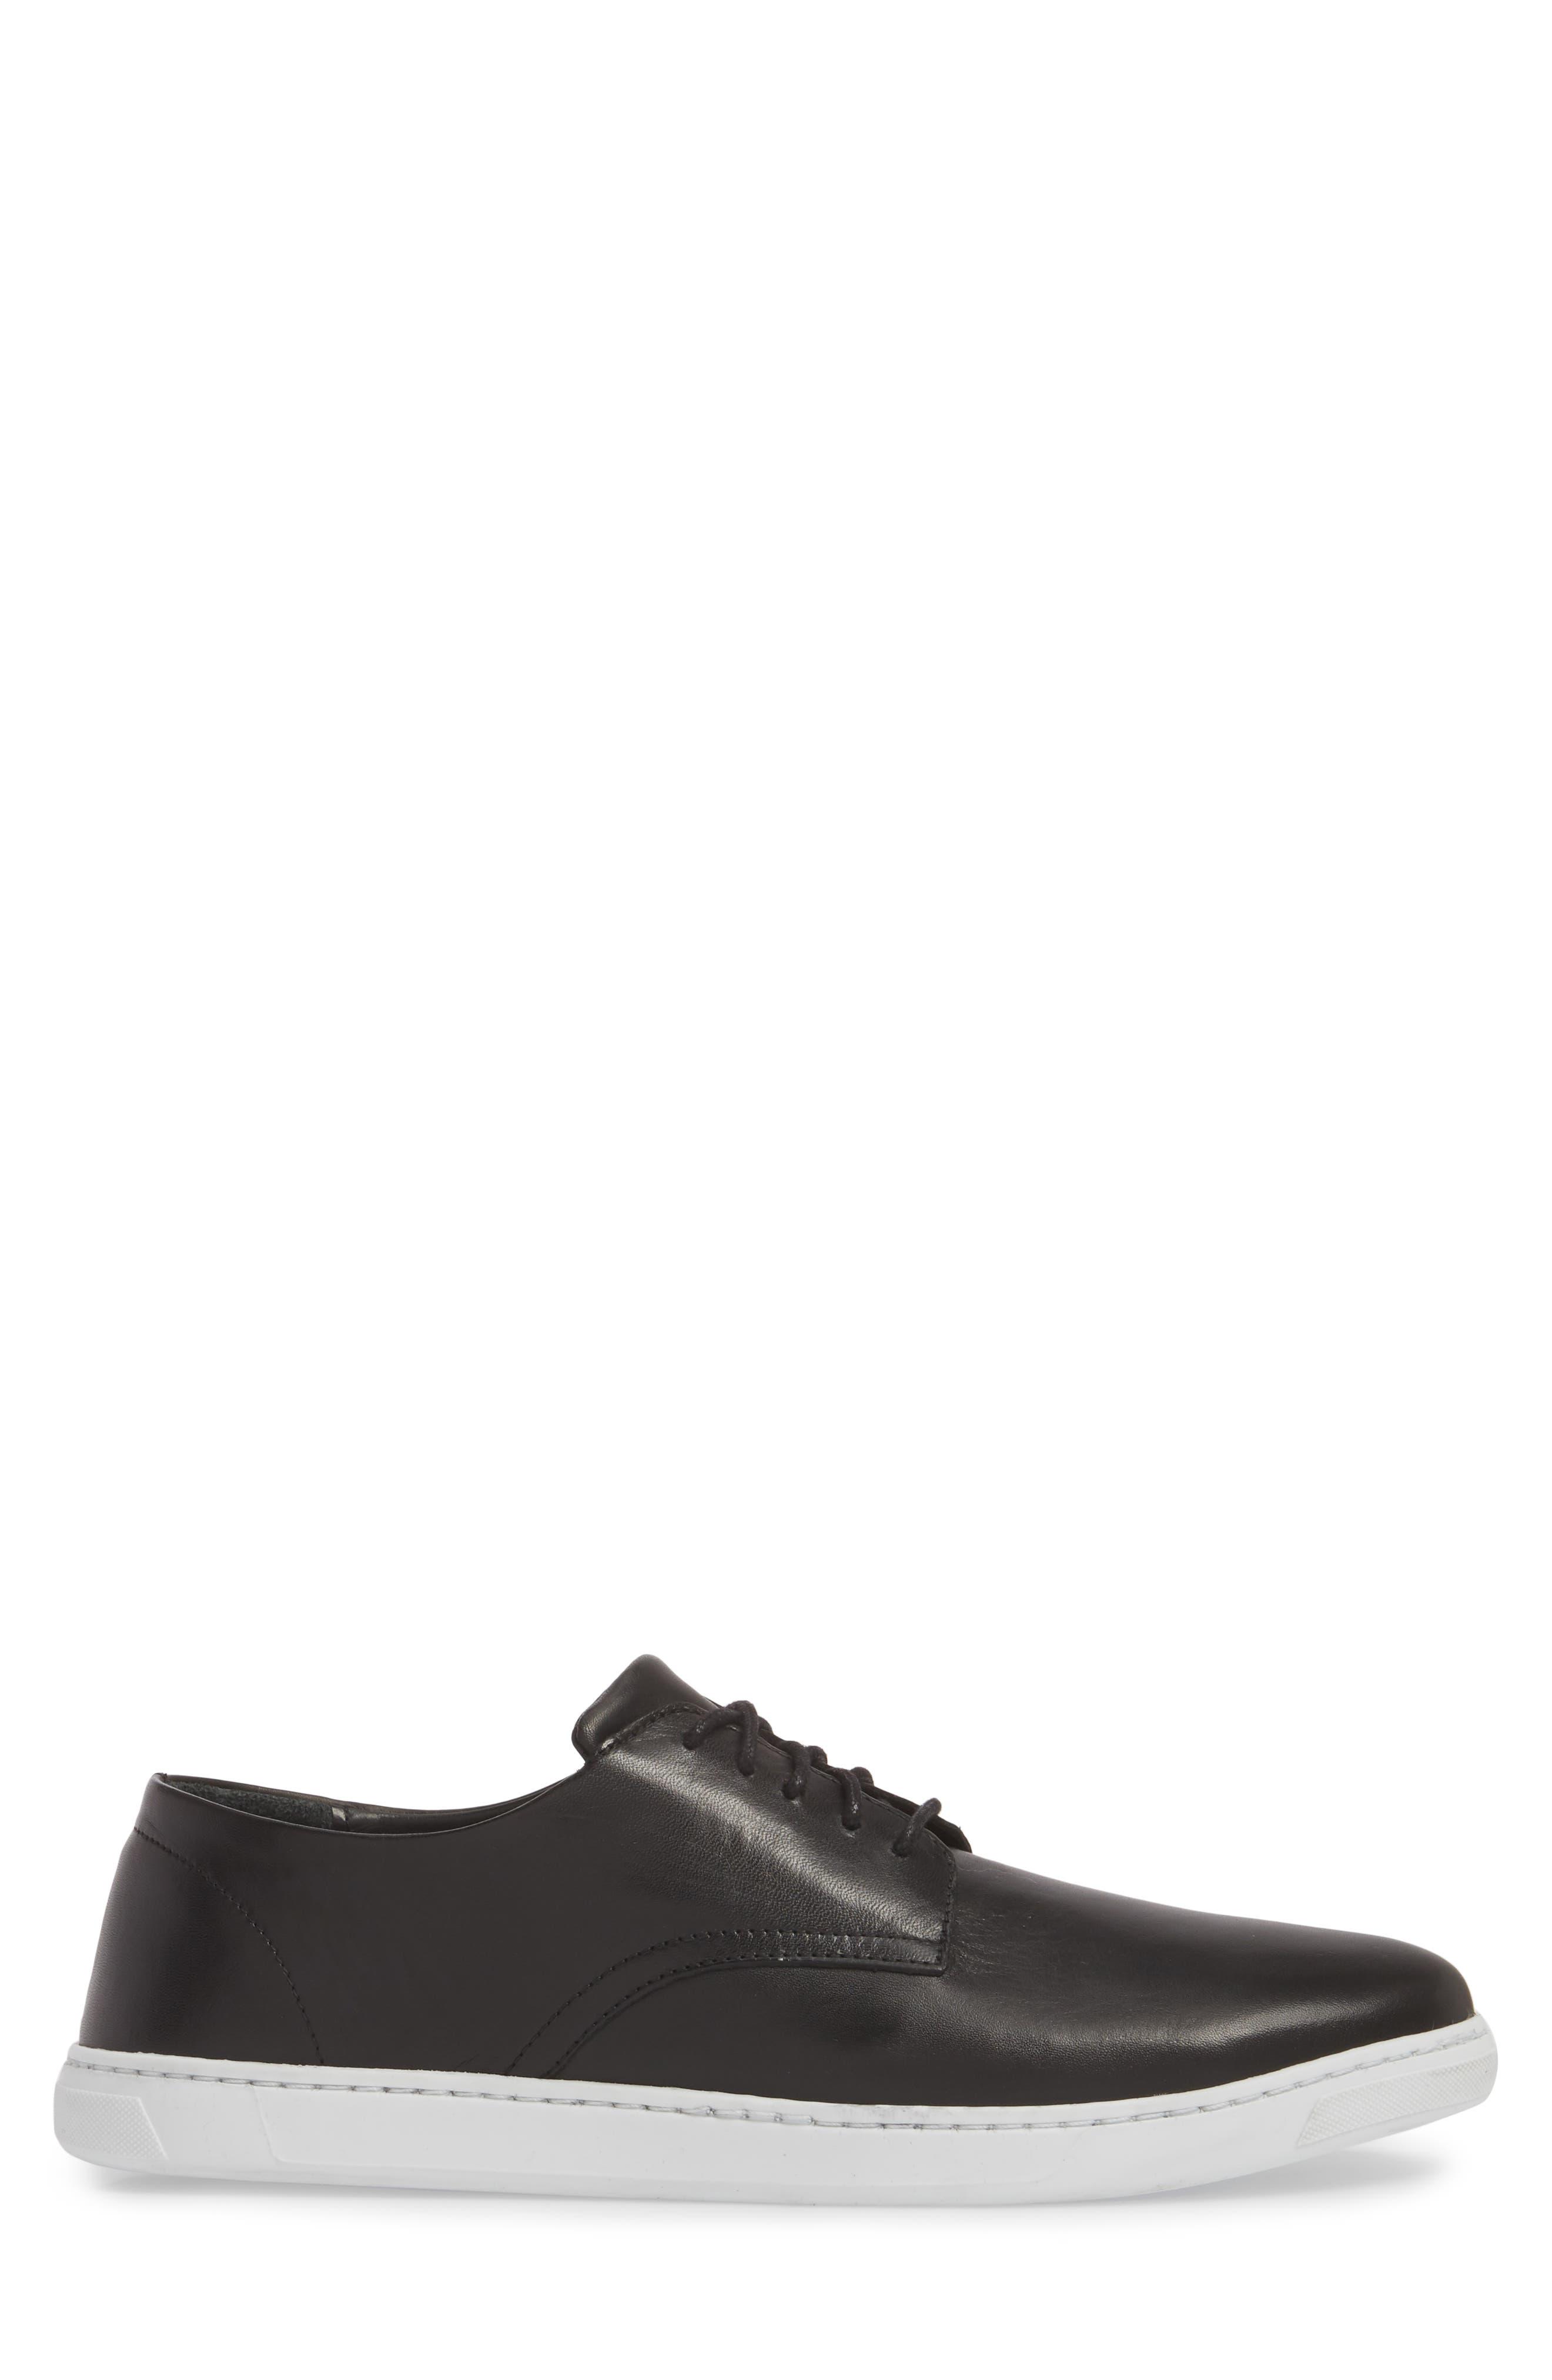 Nok Derby Sneaker,                             Alternate thumbnail 3, color,                             BLACK LEATHER